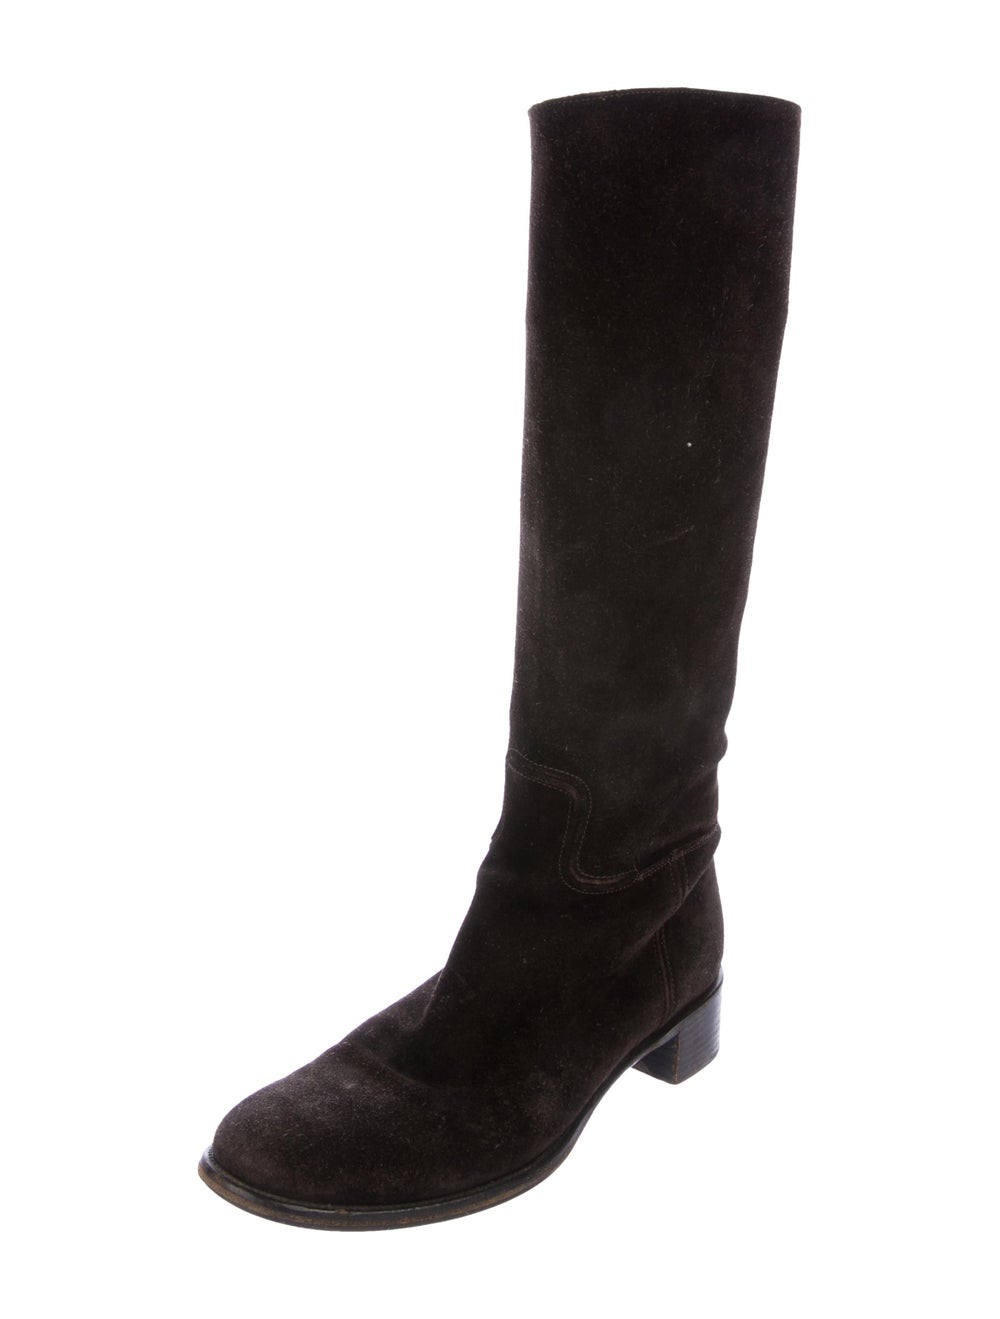 Prada Suede Knee-High Boots - image 2